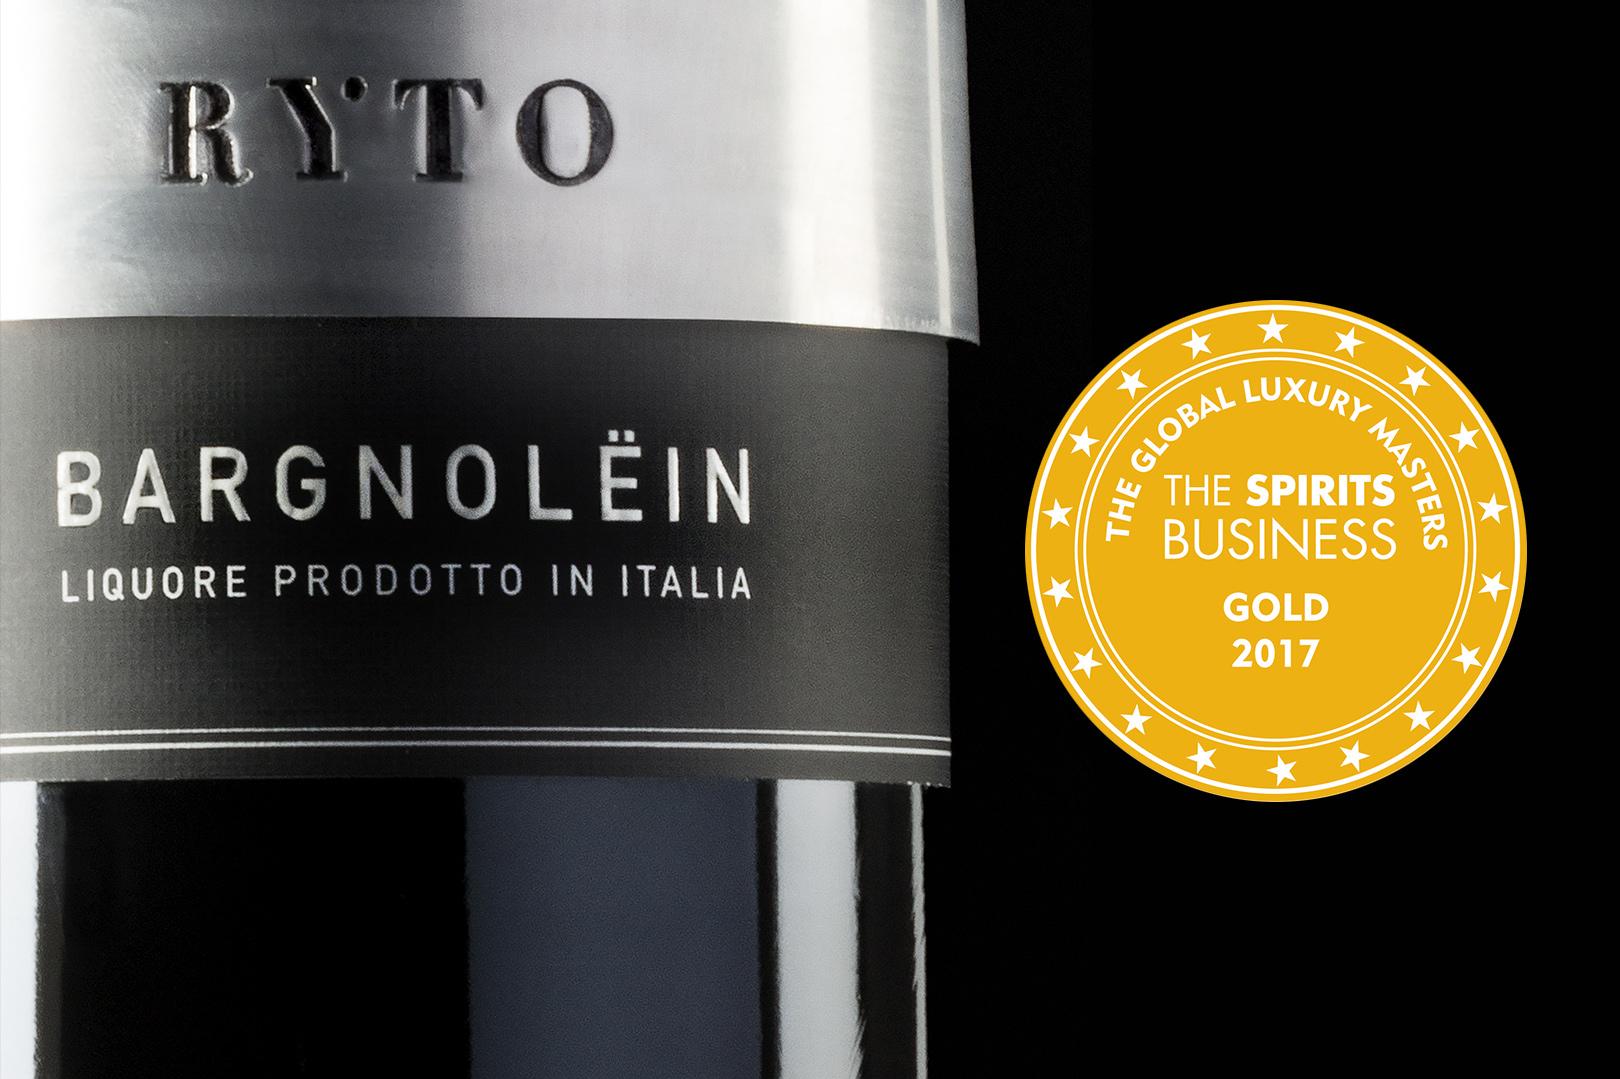 ryto-award-bargnolein-ryto